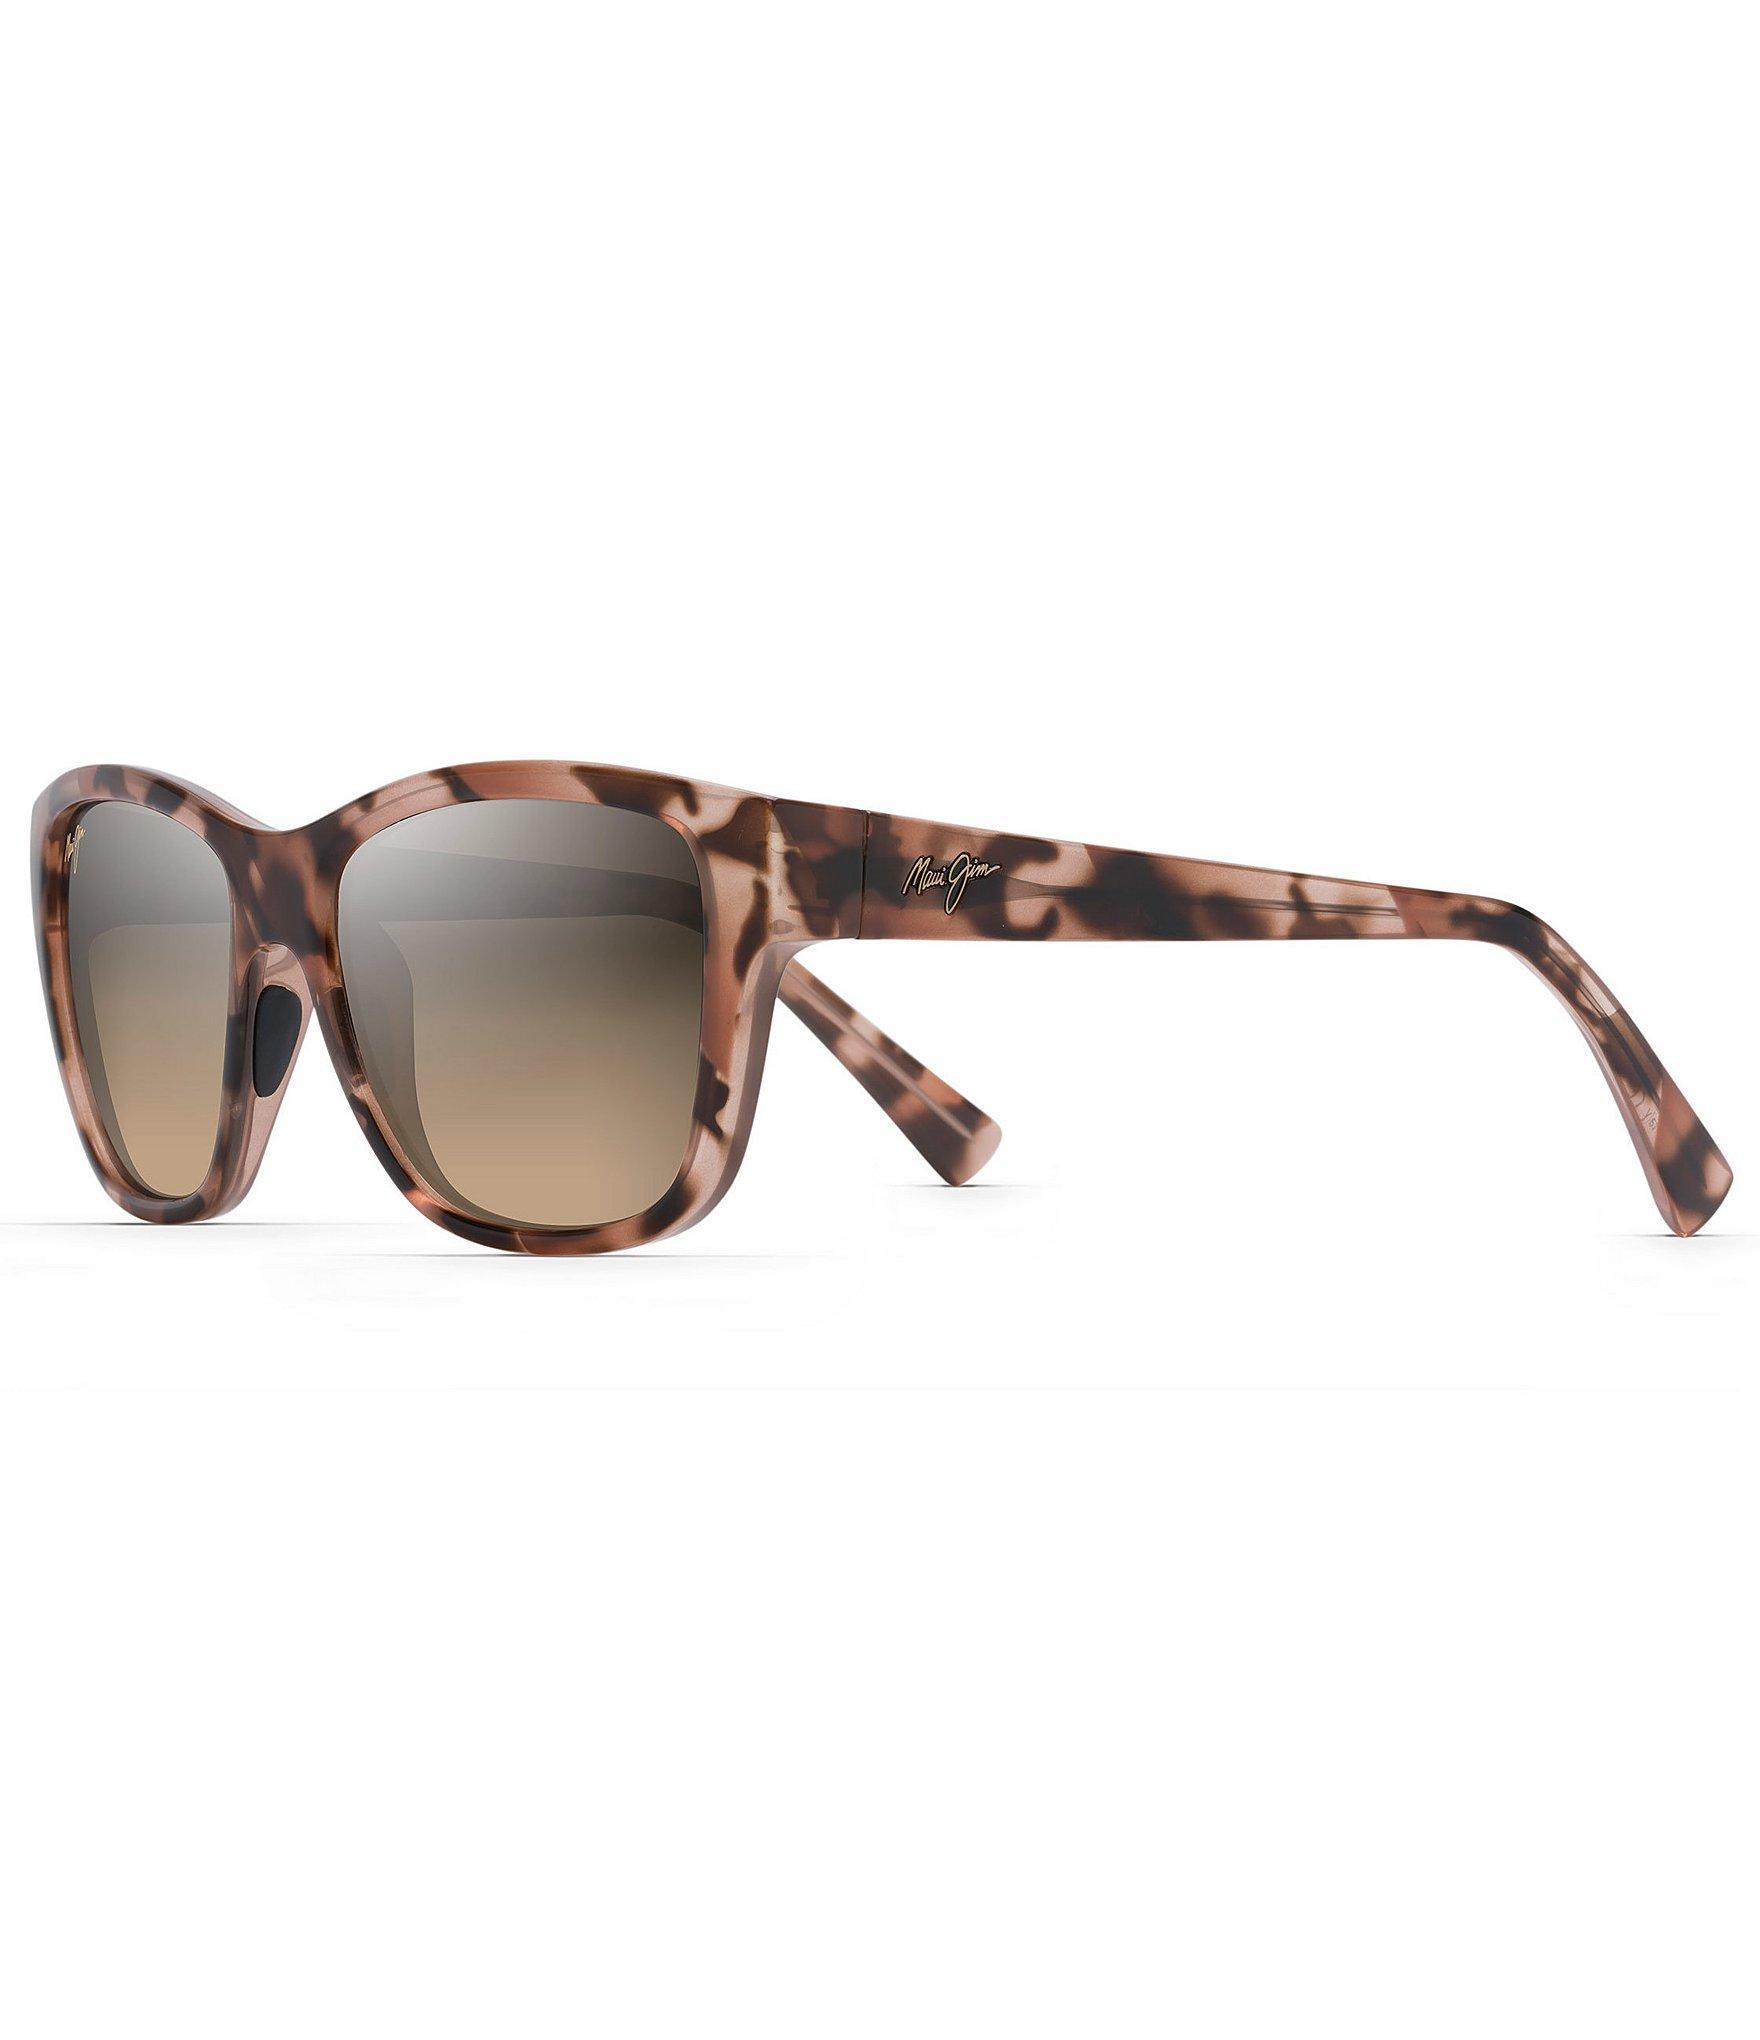 dbebd39964bf Maui Jim - Brown Hanapa' A Polarized Classic Sunglasses - Lyst. View  fullscreen